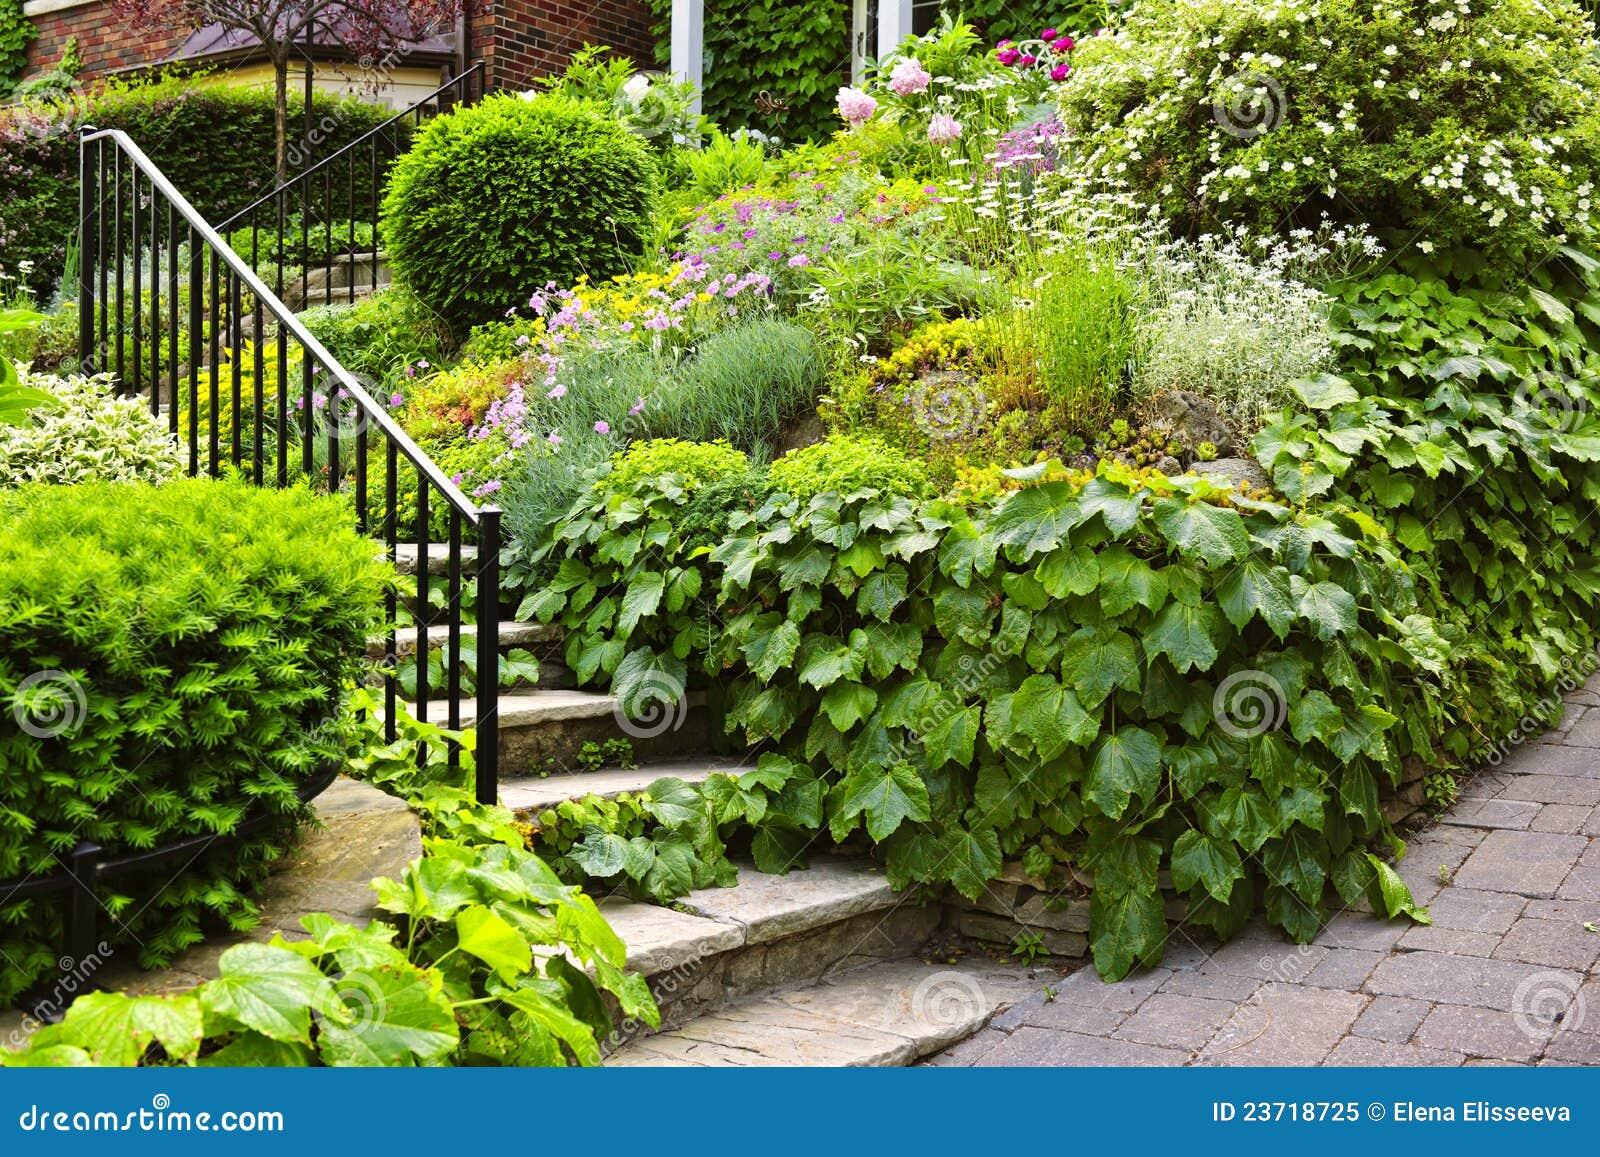 escada de pedra no jardim:Natural Stone Garden Stairs